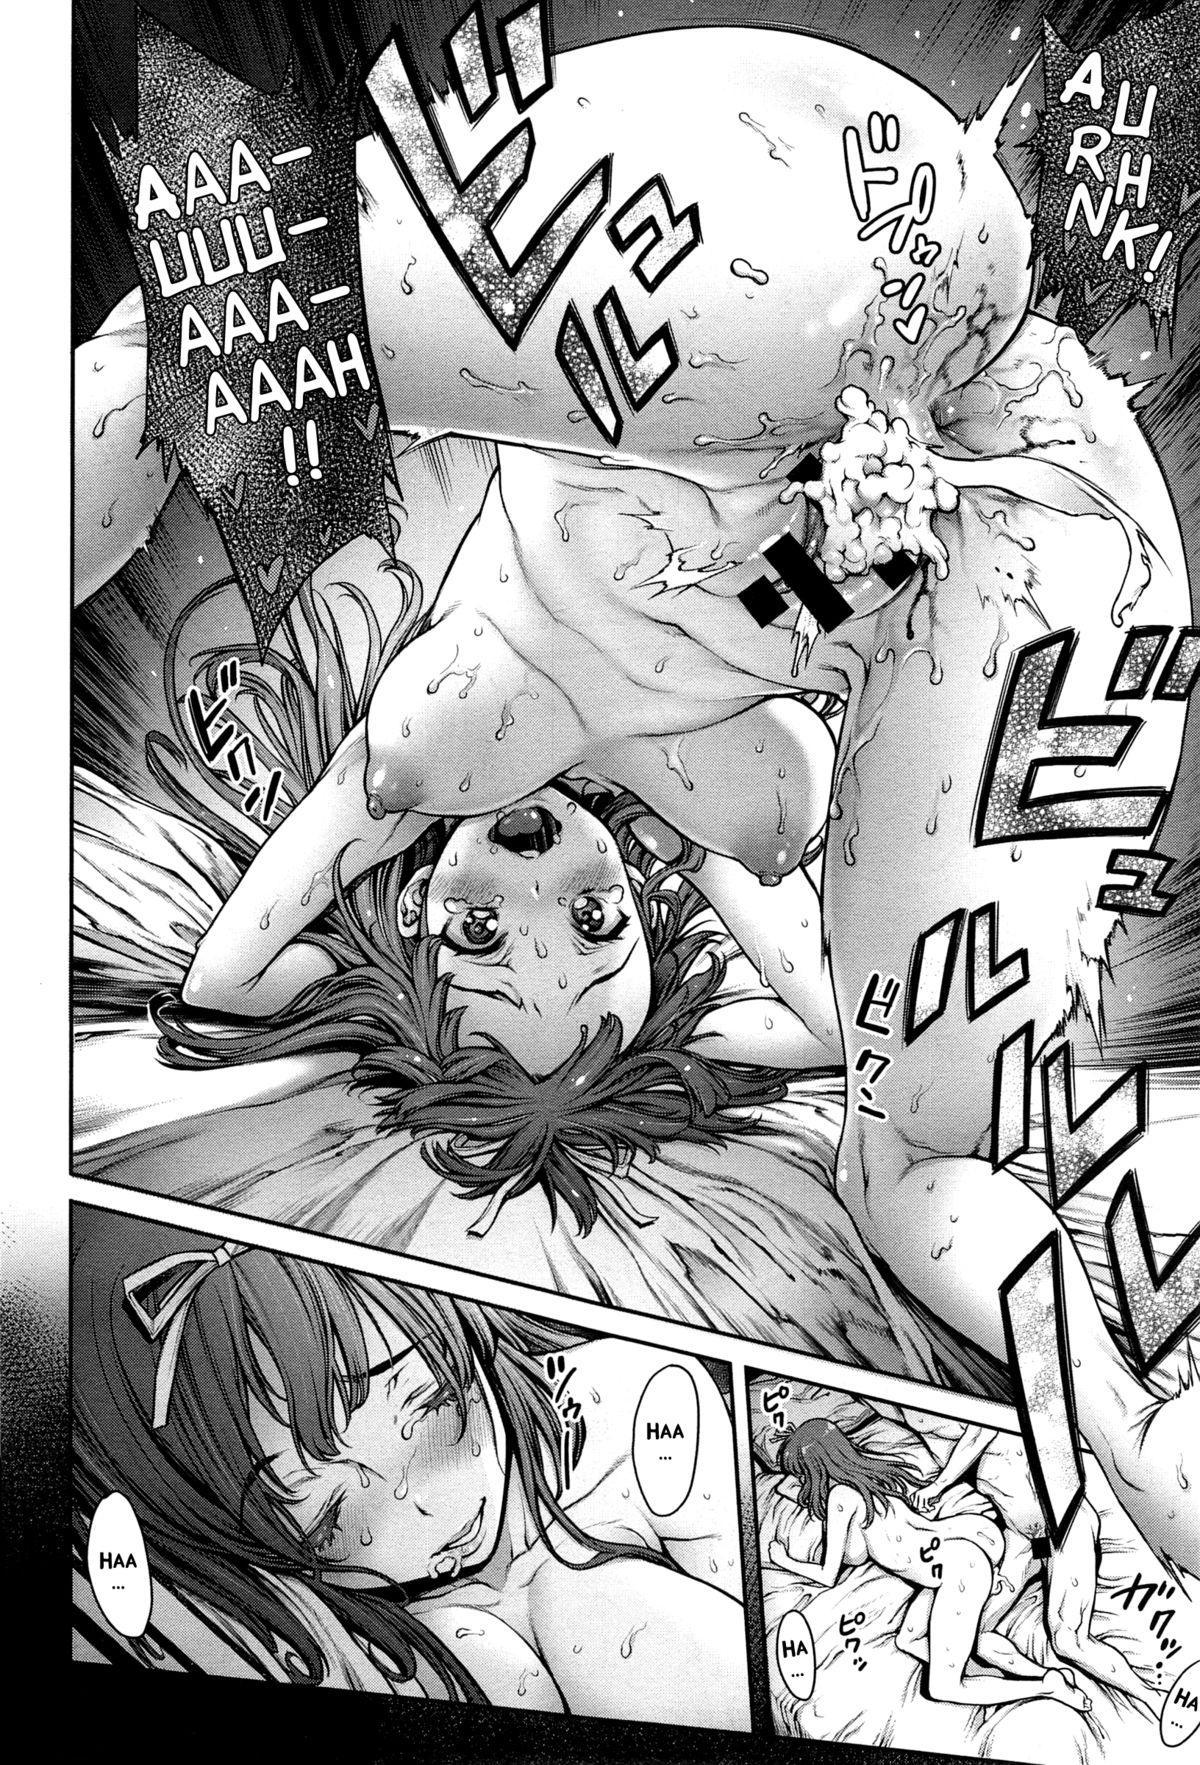 [Okayusan] Omoide Shasei 2 ~Kisei Shite Shasei Shite~ | Ejaculation Memory 2 (COMIC anthurium 019 2014-11) [English] {Batman} 15